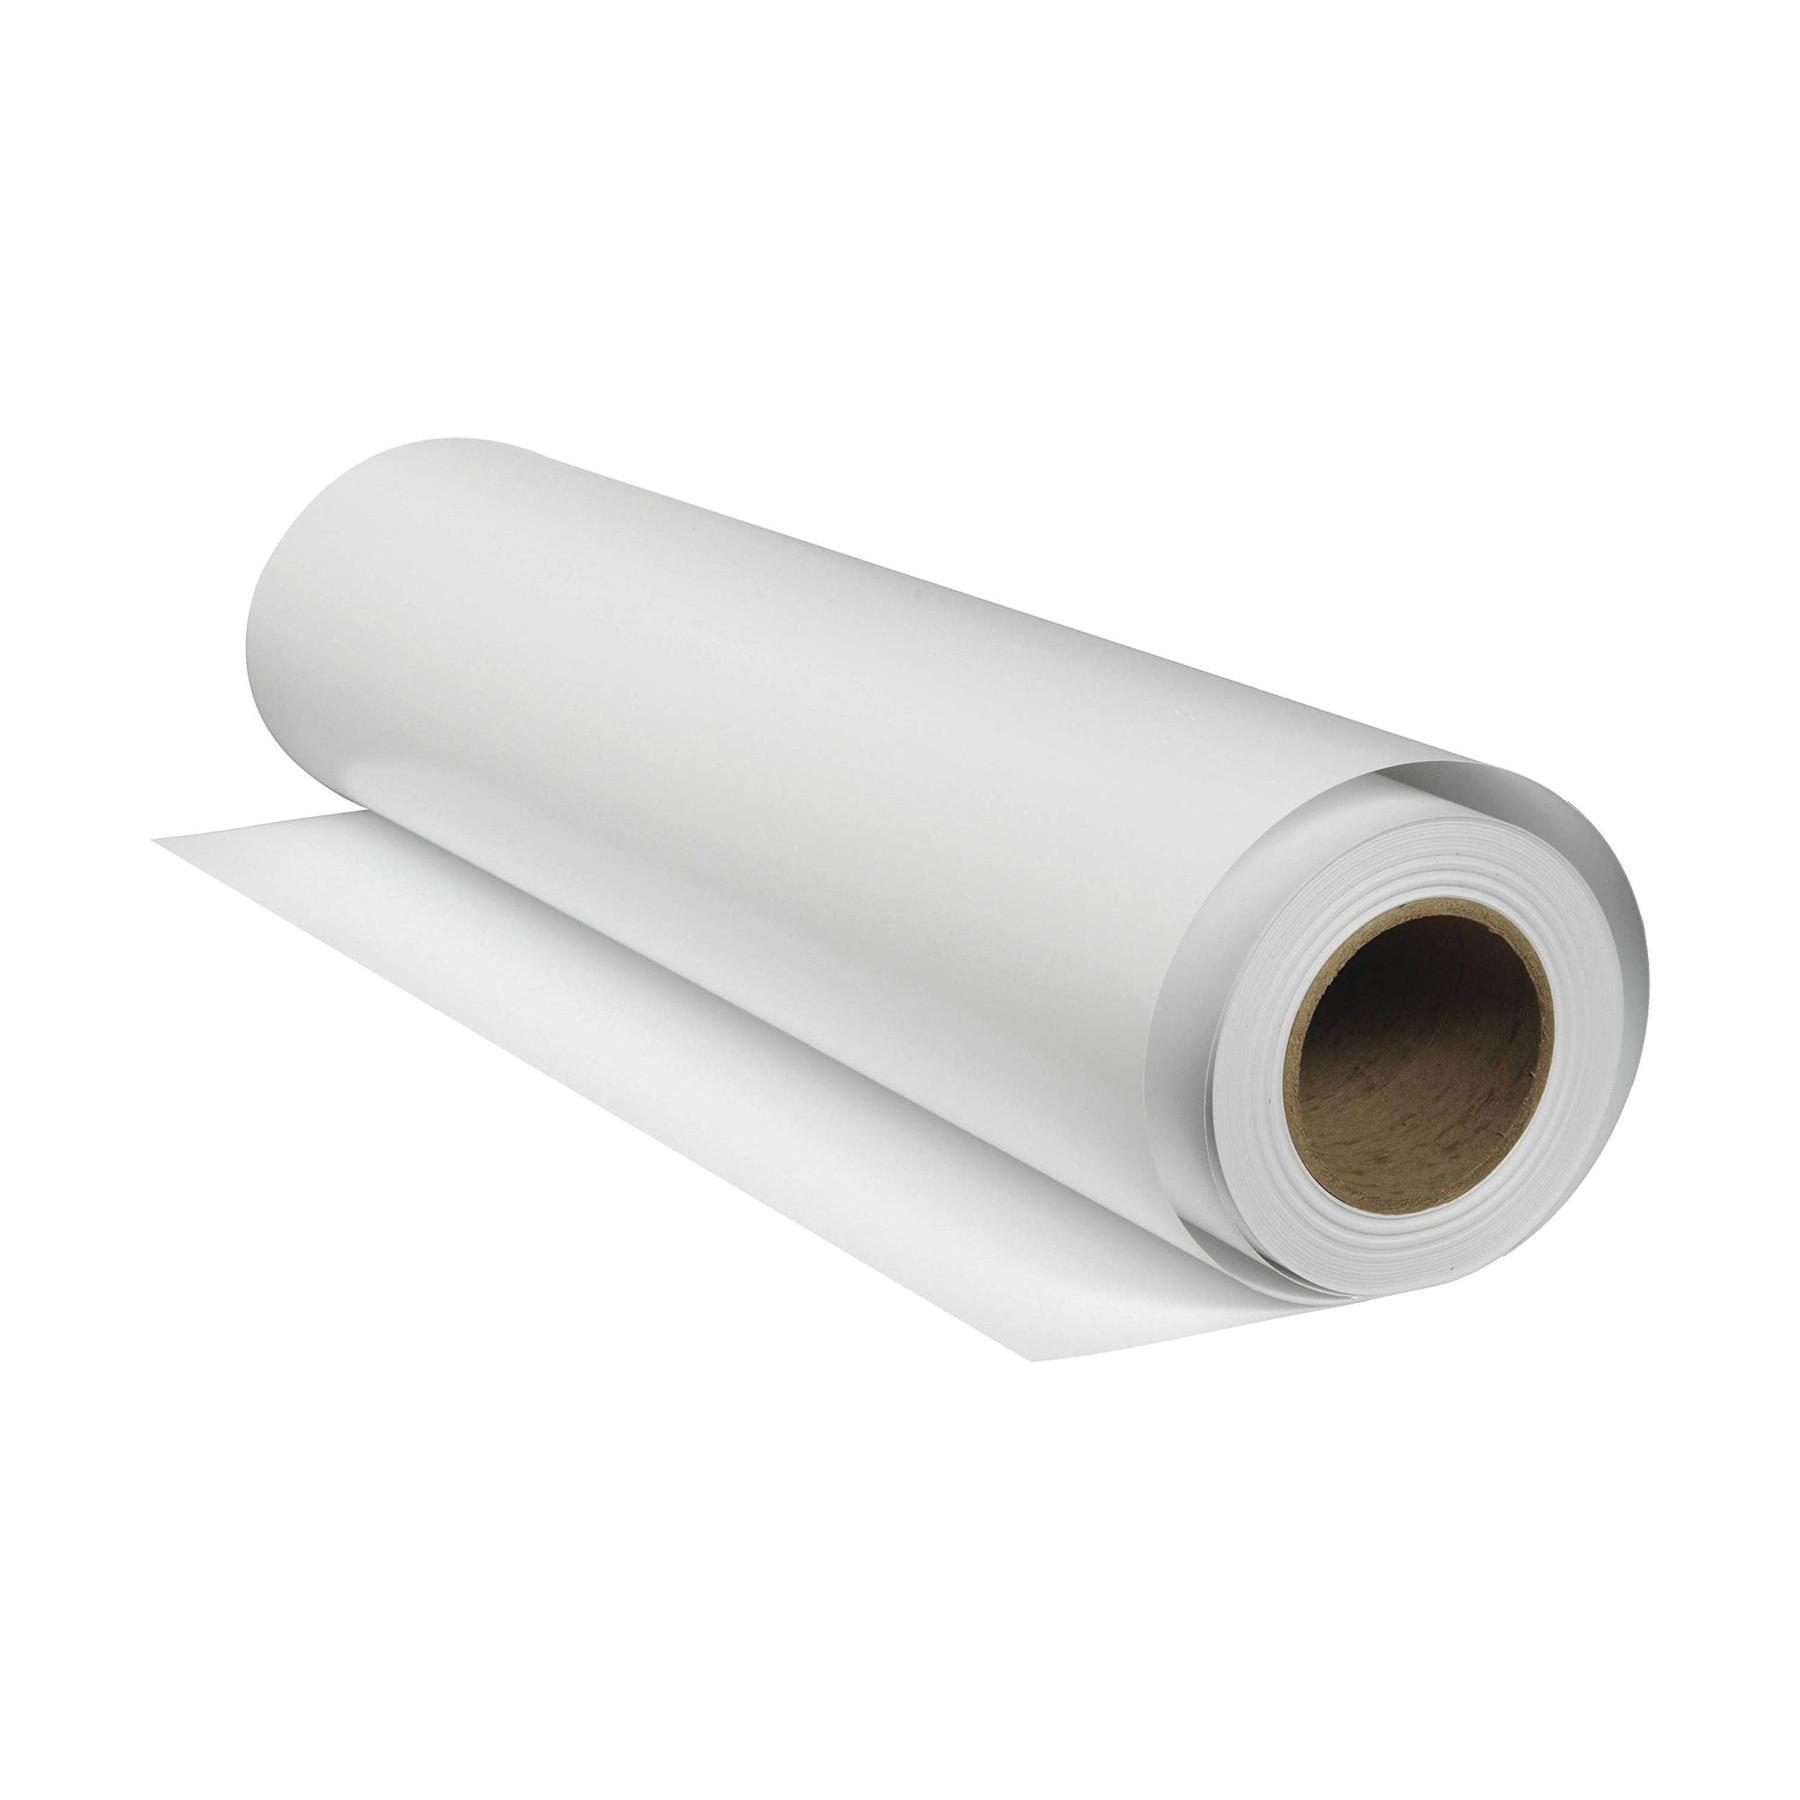 "Epson Surelab Pro-S Luster 8"" x 65m Blanco - Papel fotográfico (248 g/m², Blanco, 2 hojas, 18%, 65 m, 20,3 cm)"